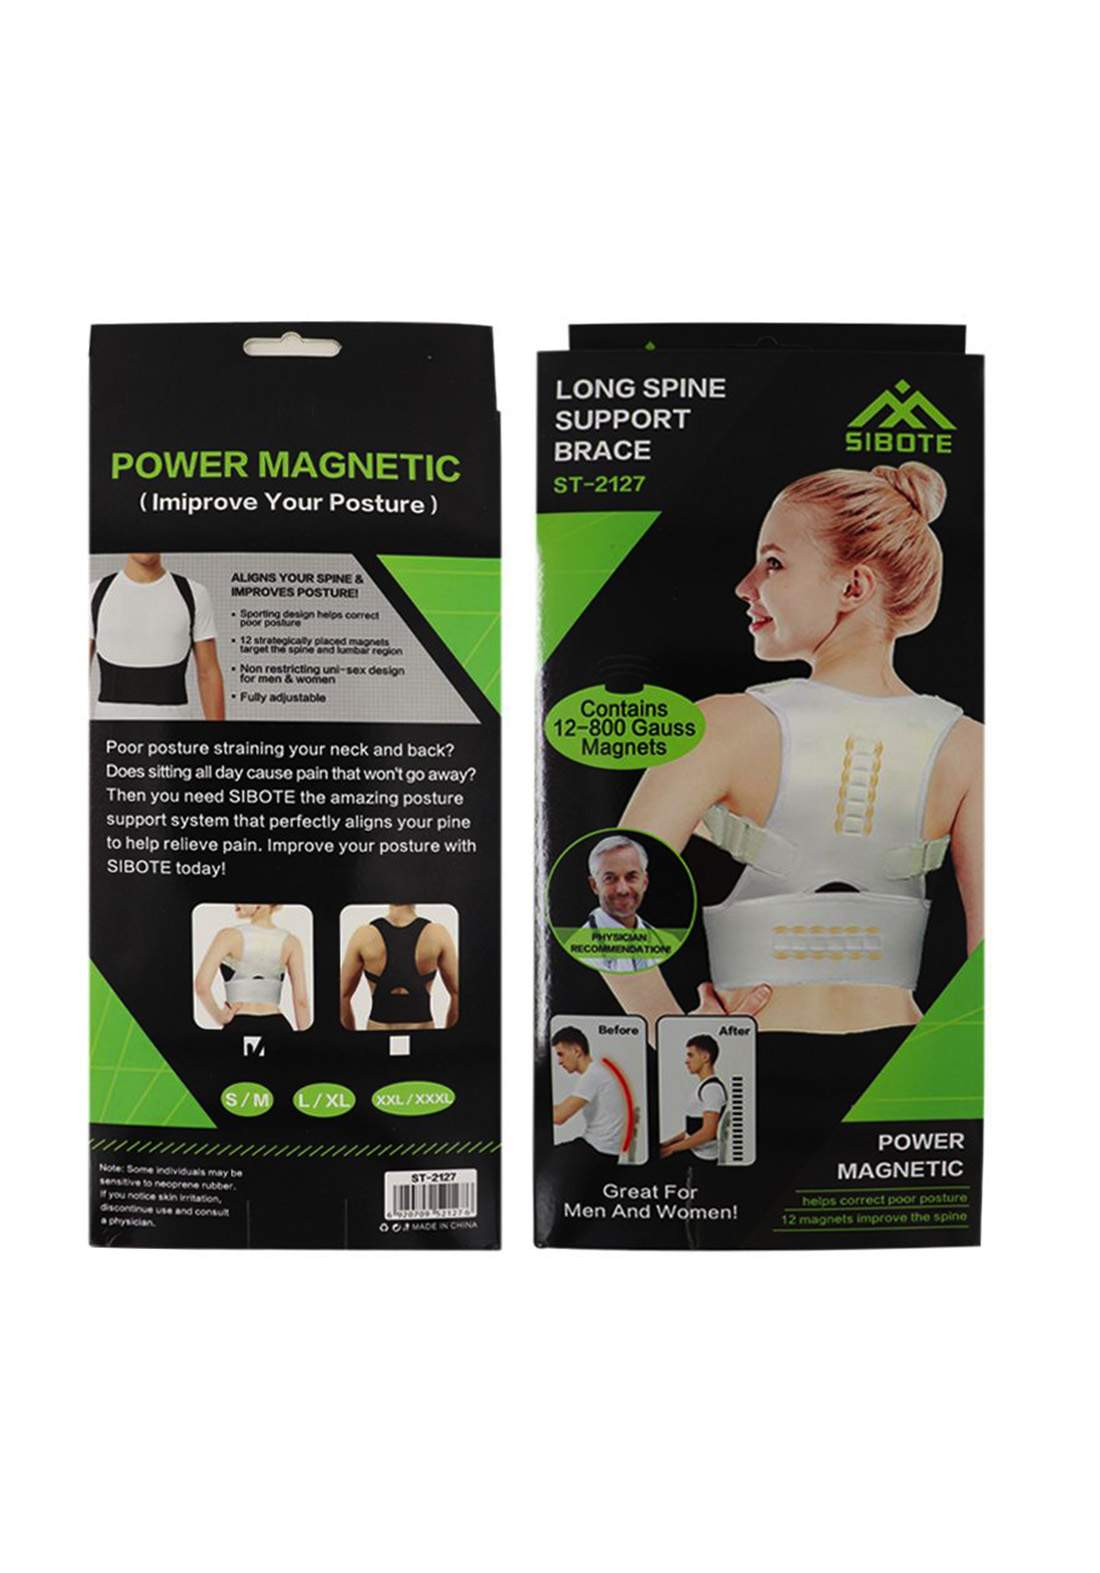 Sibote Power Magnetic Long Spine Support Brace مشد و حزام الظهر المغناطيسي لتقويم الظهر